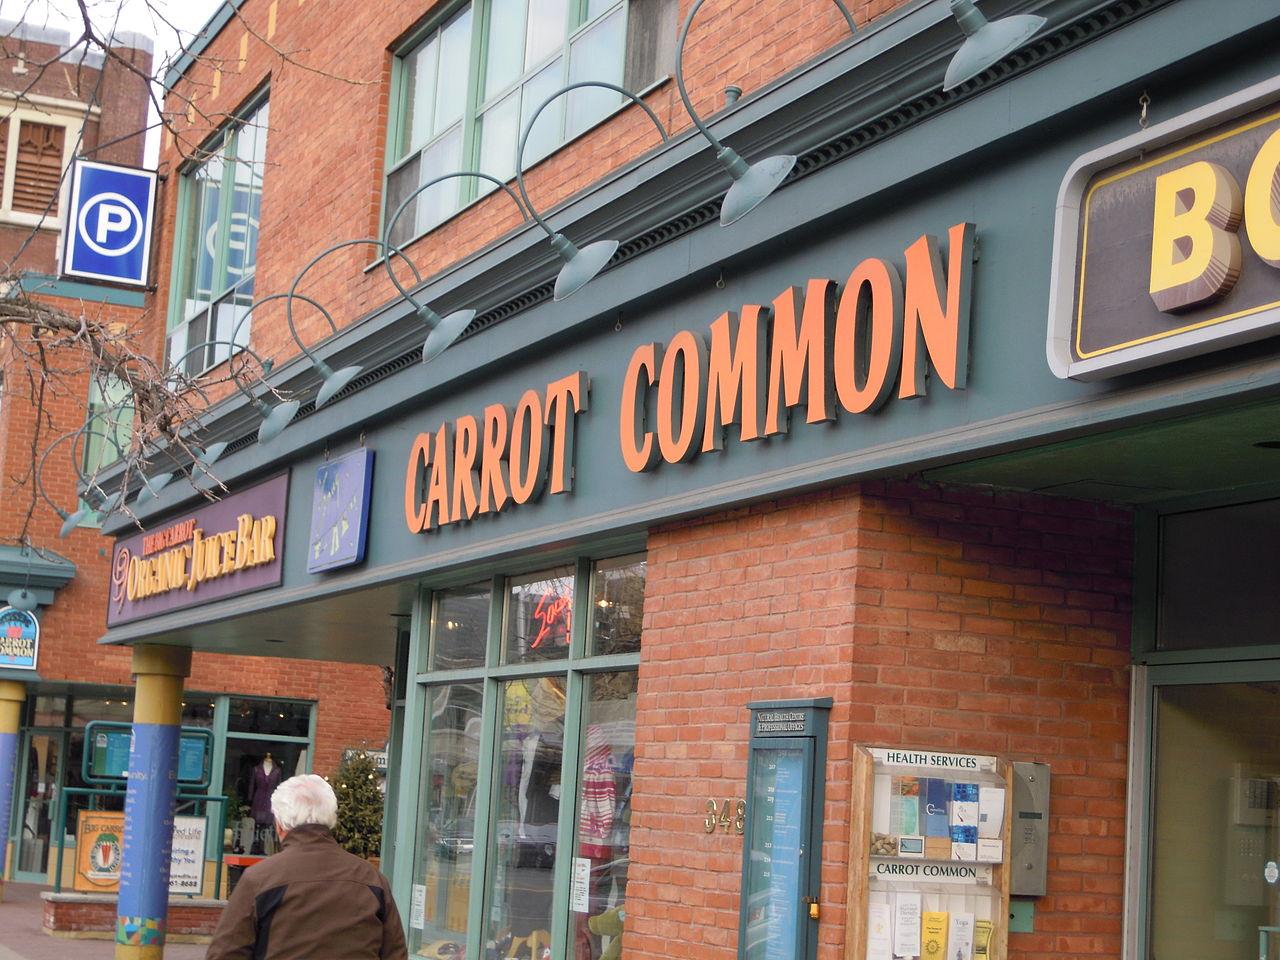 Carrot Common storefront sign on 384 Danforth Avenue, Greektown Toronto.